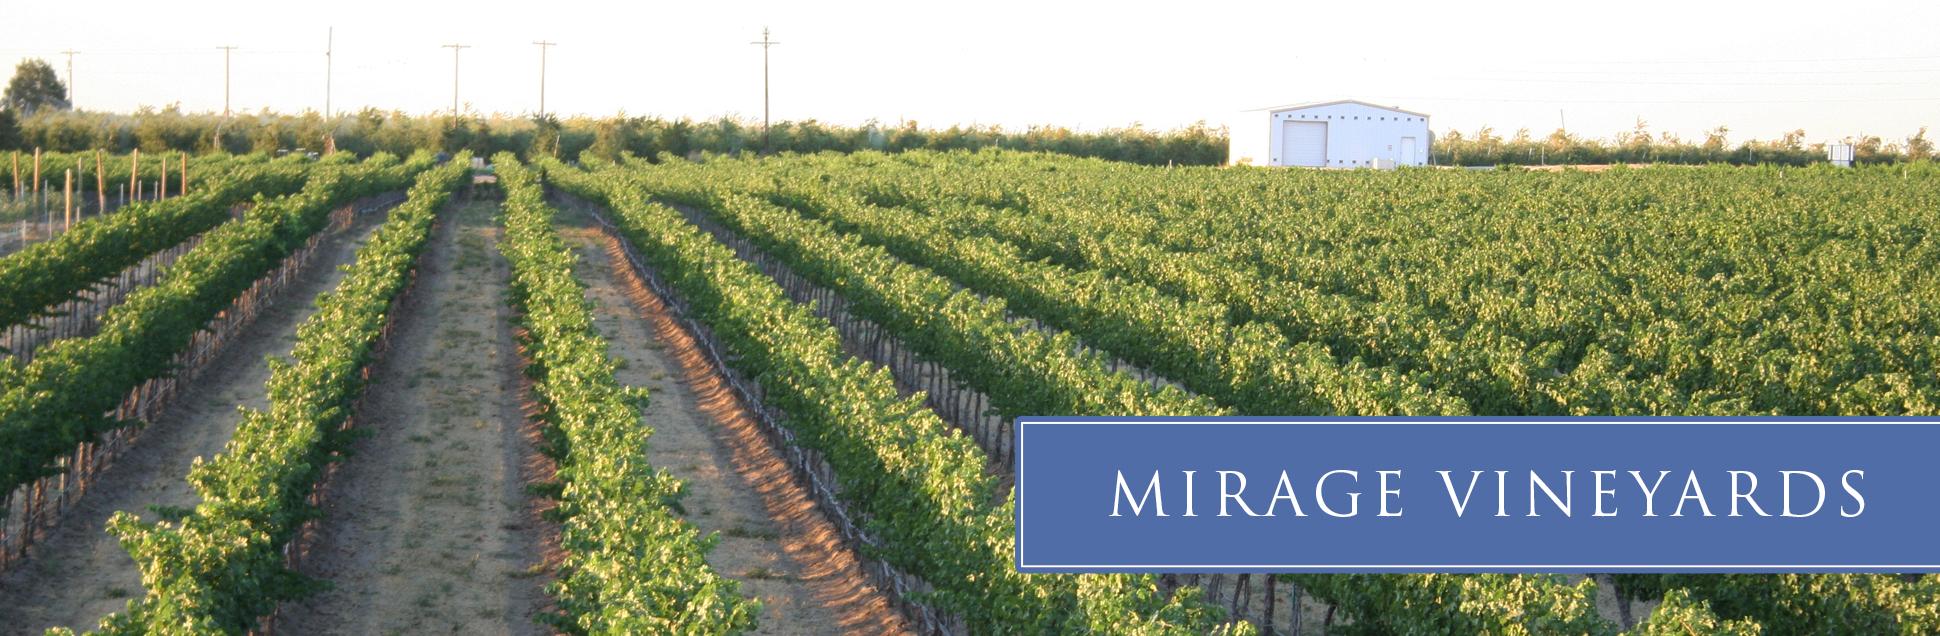 mirage-vineyard-05.jpg